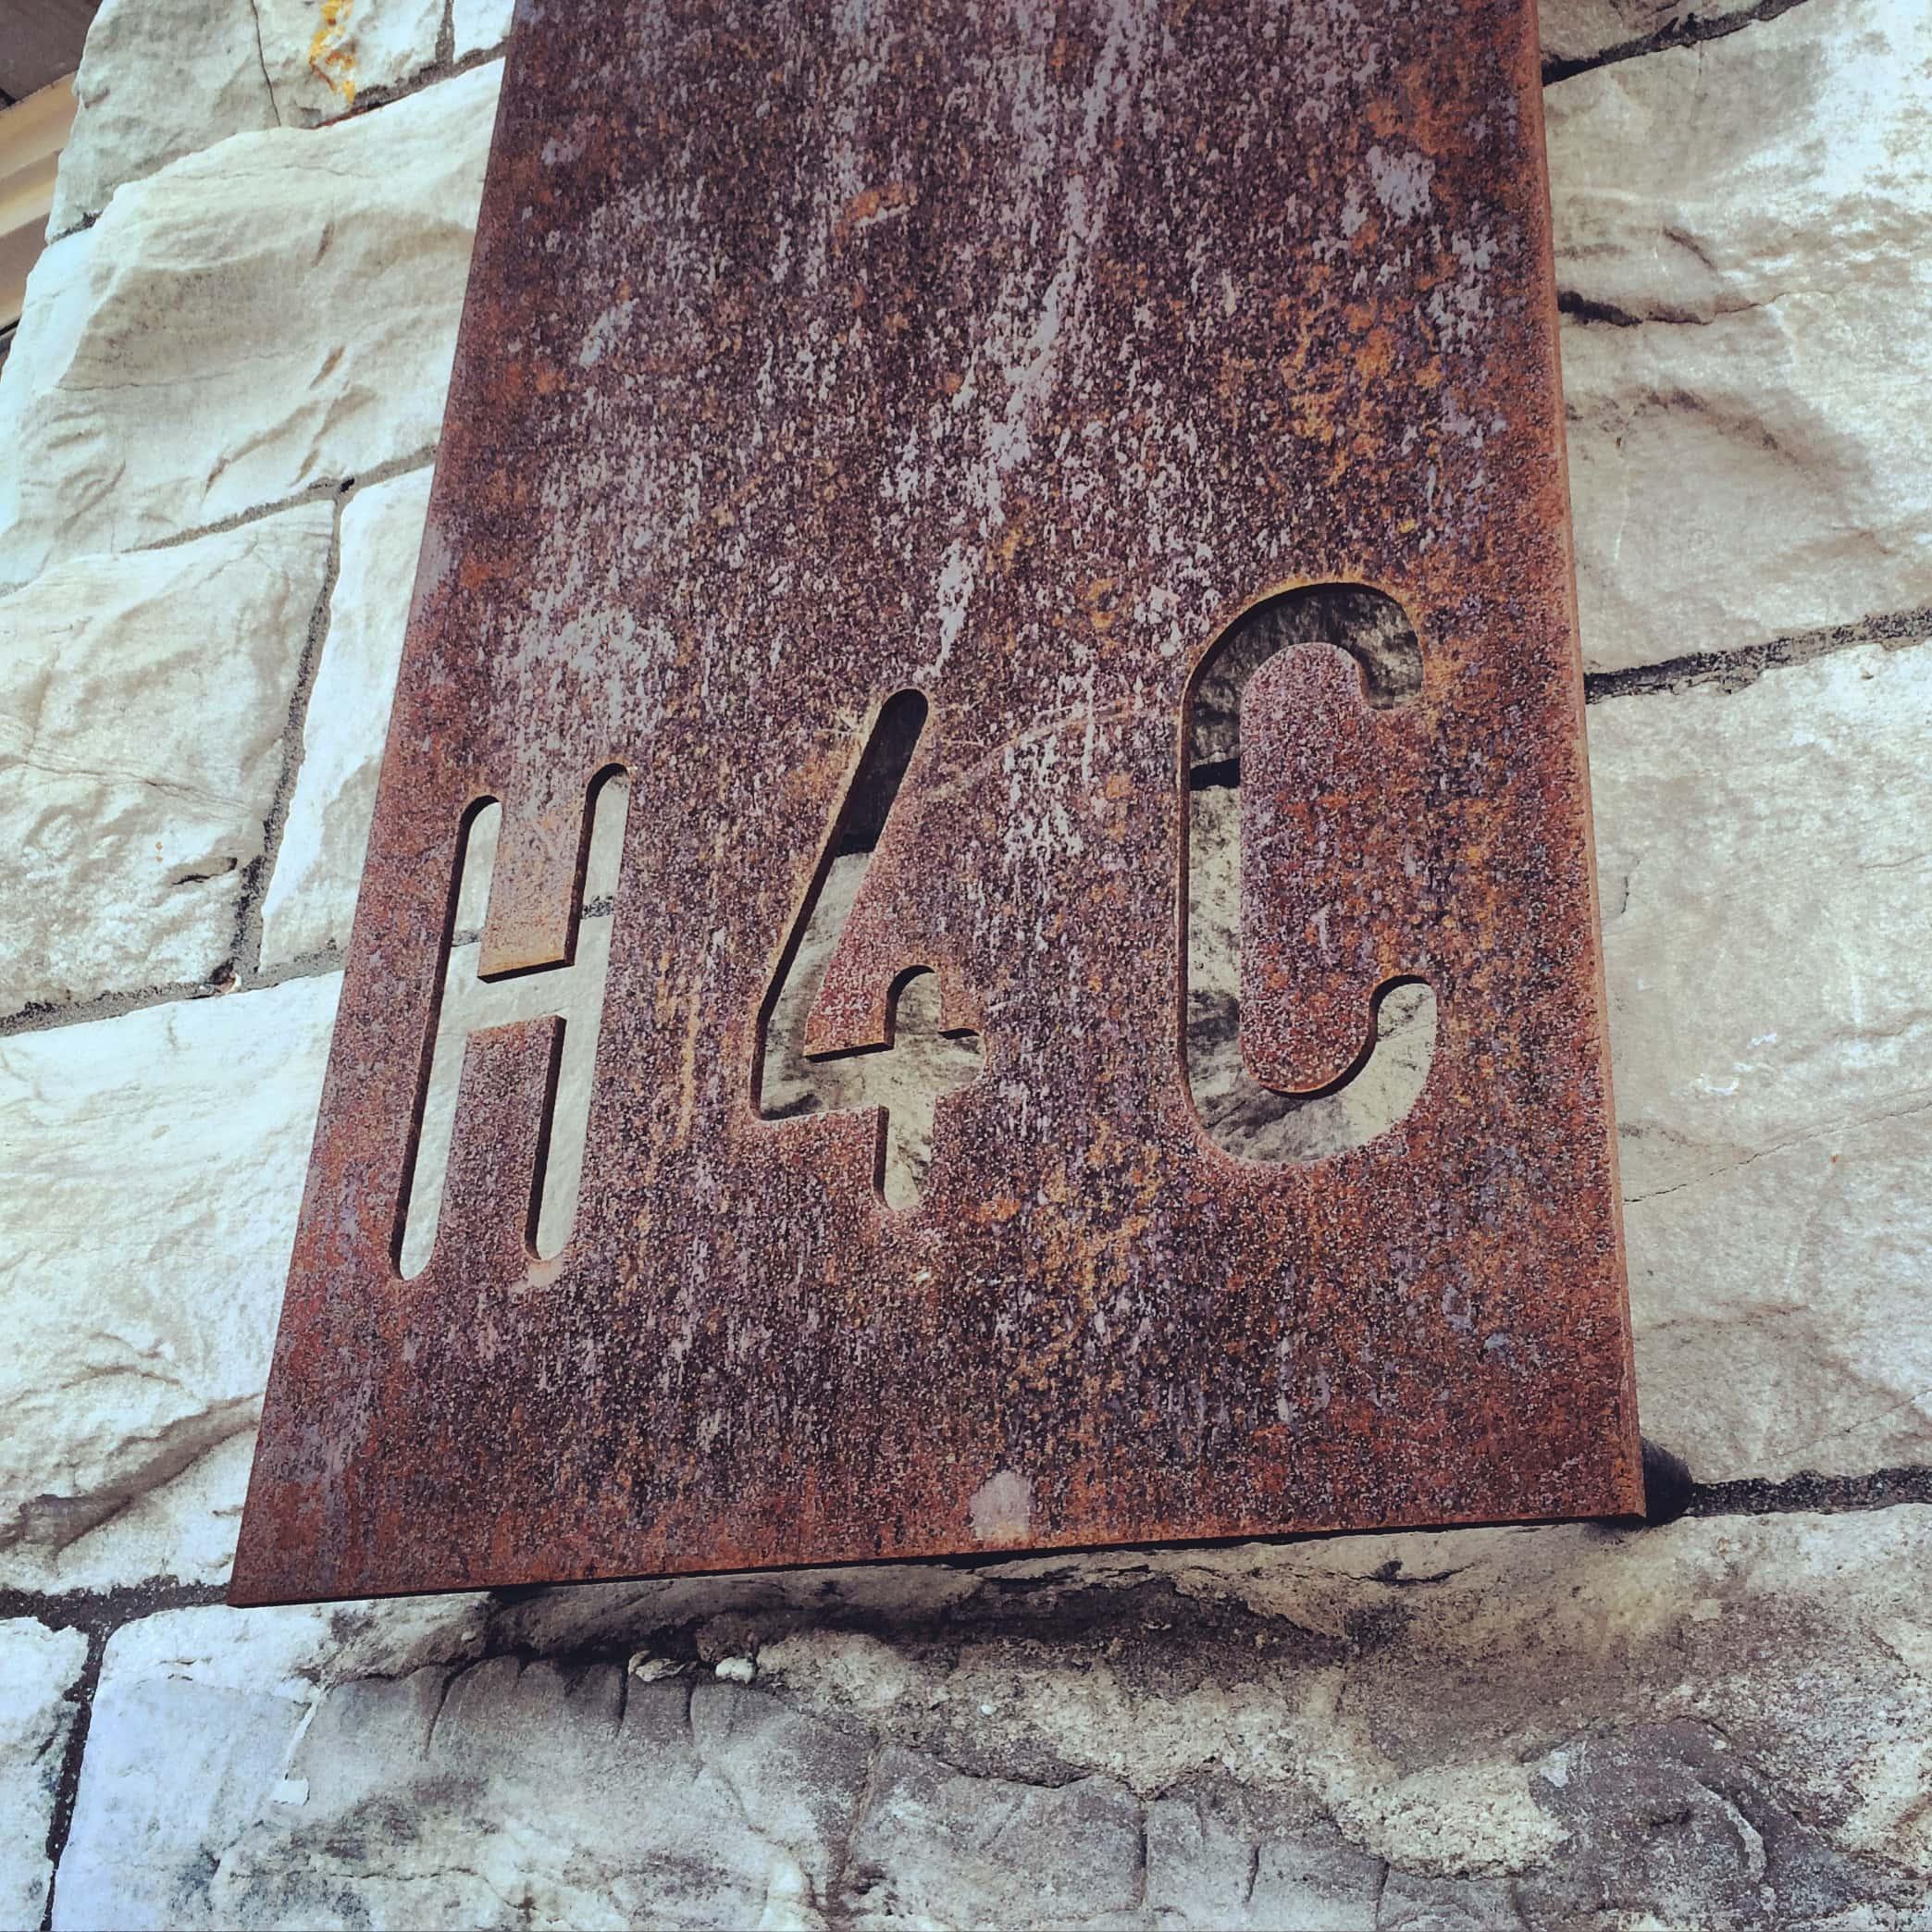 h4c-st-henri-restaurant-9